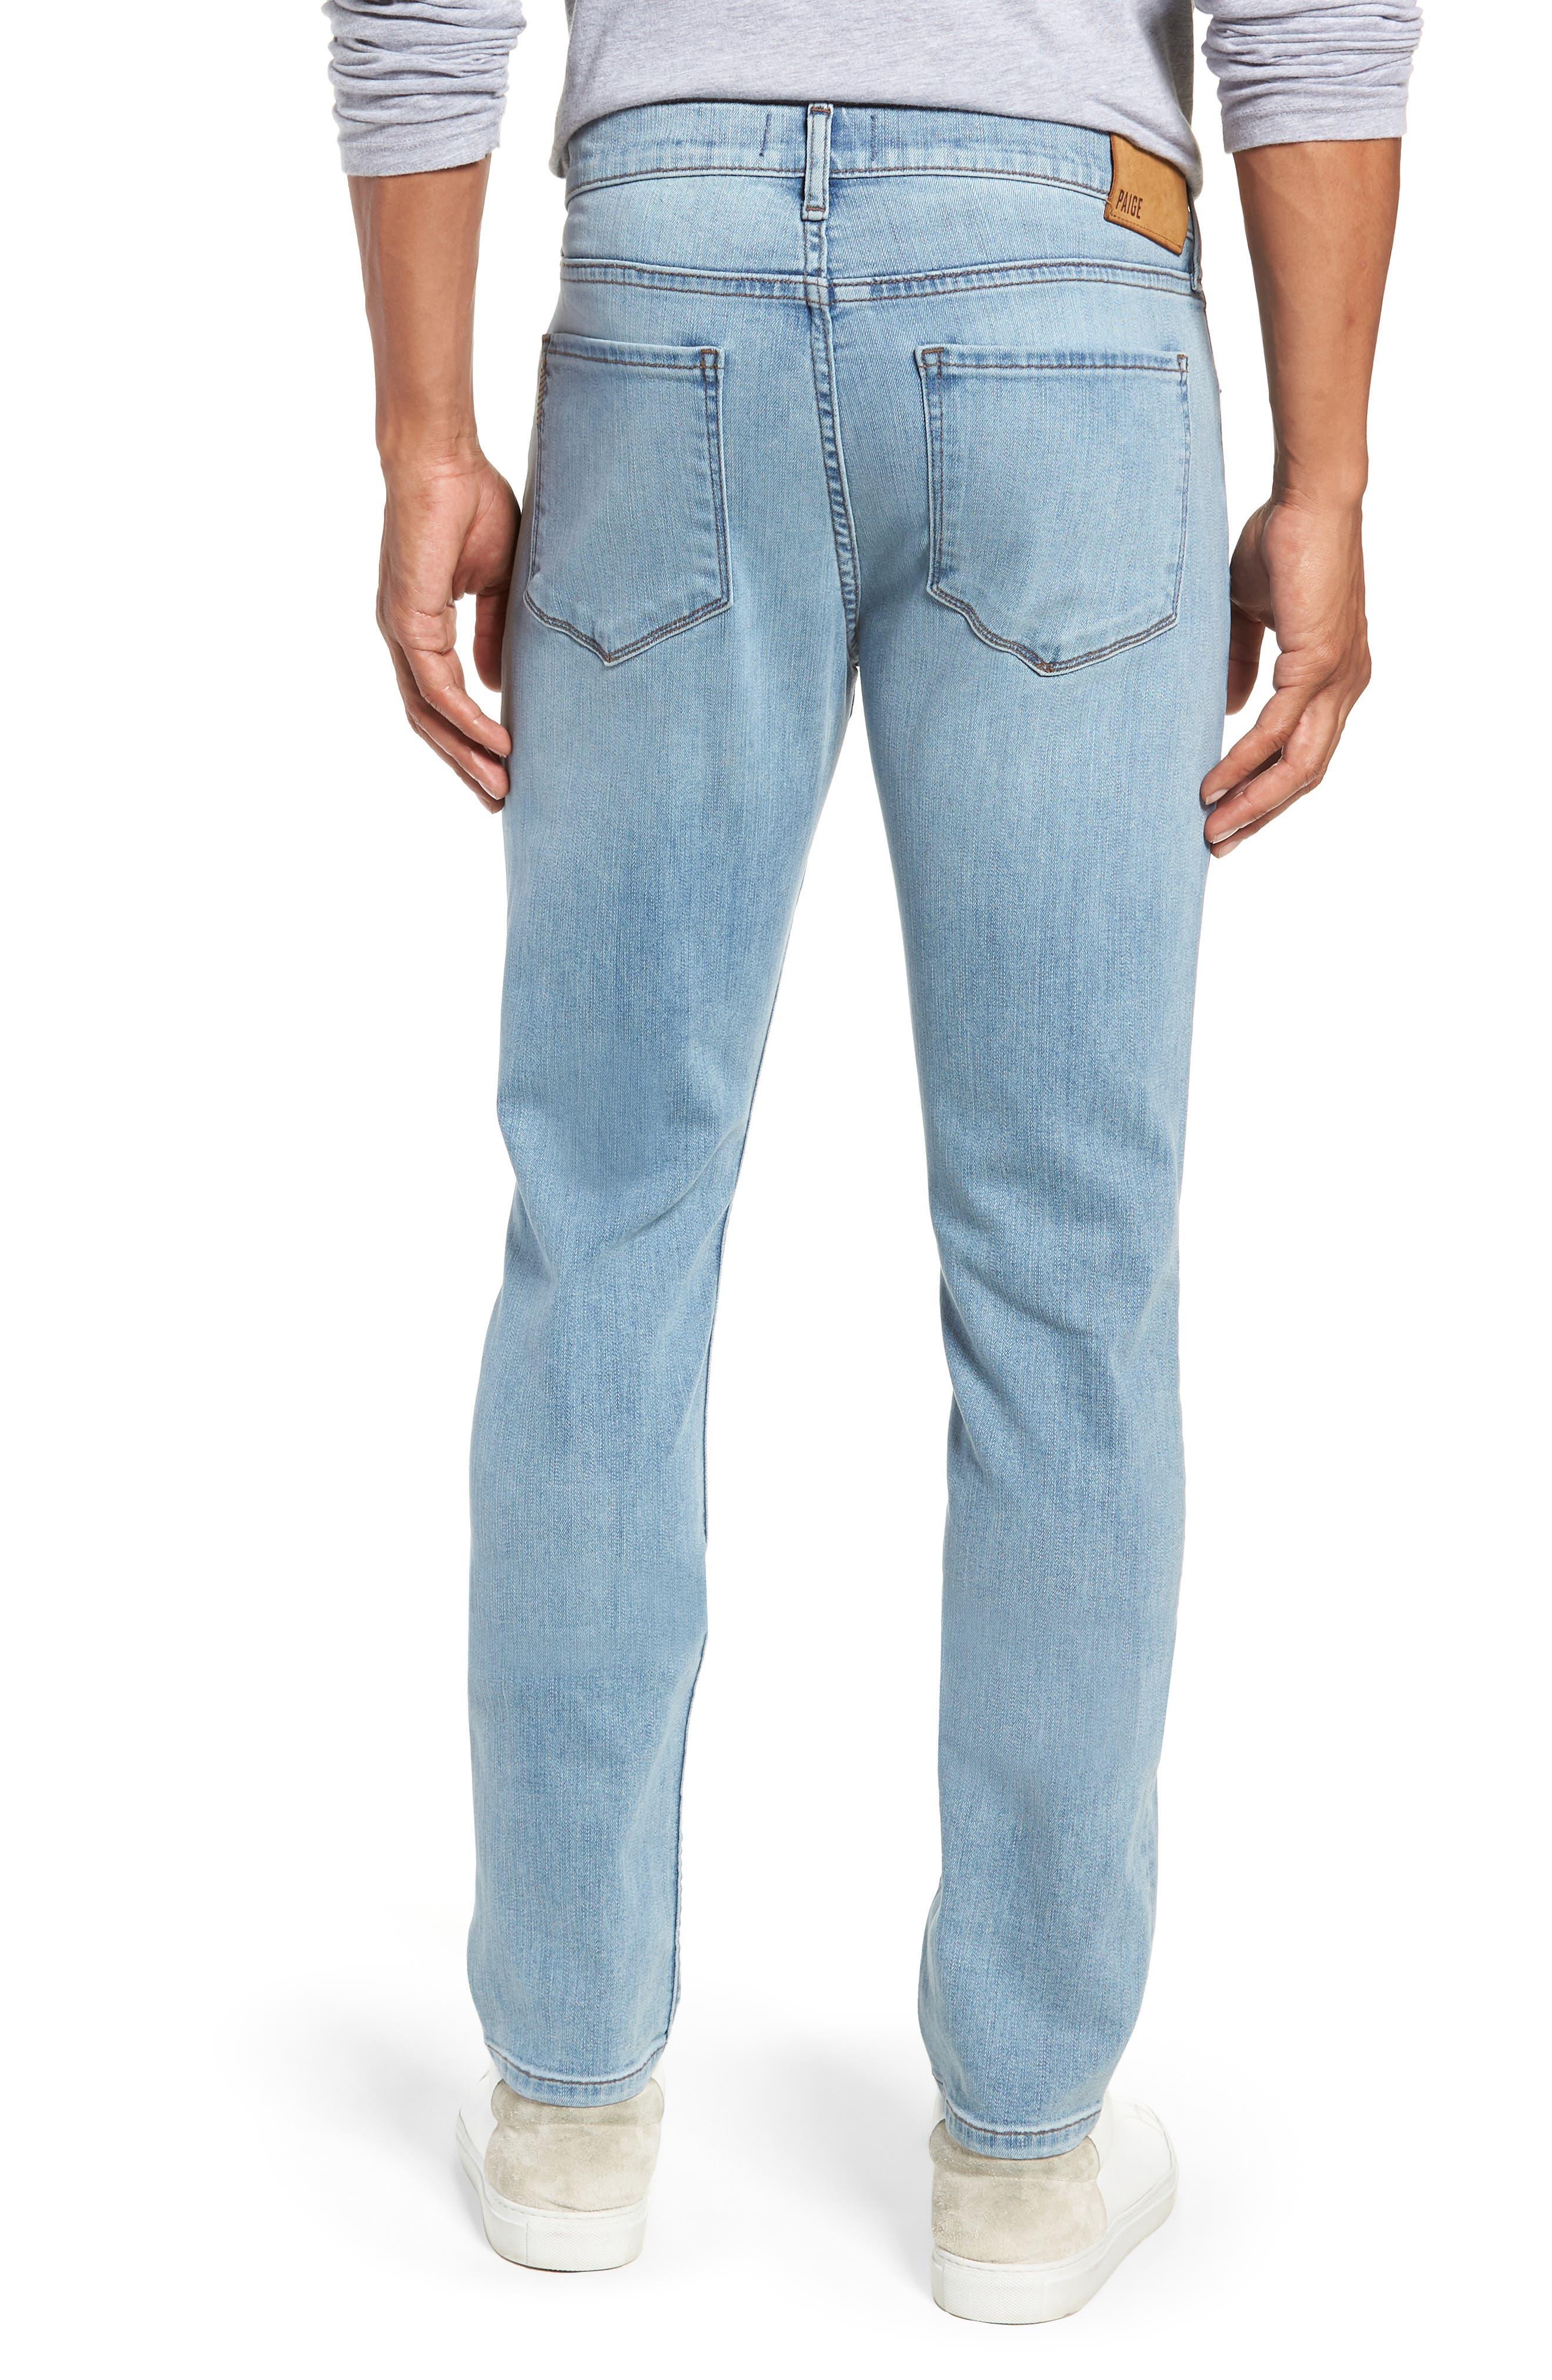 Transcend Vintage - Lennox Slim Fit Jeans,                             Alternate thumbnail 2, color,                             DENVER